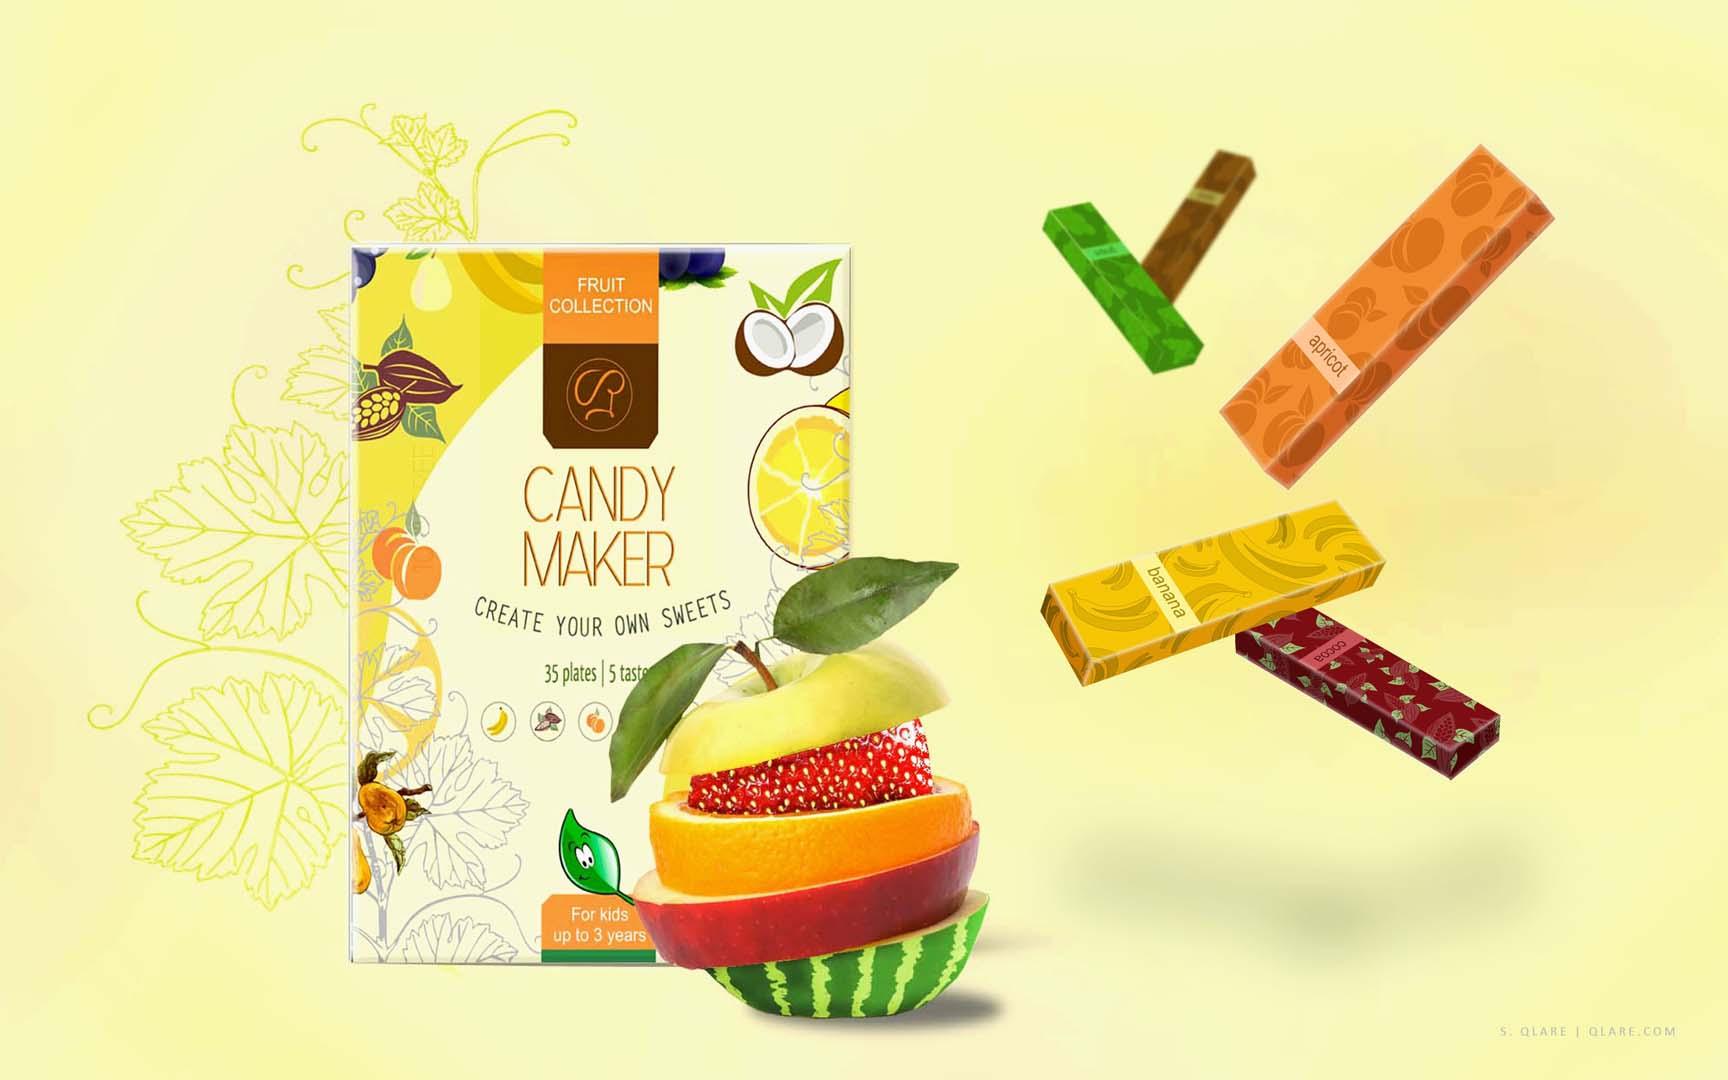 sweet package design service qlare shvechkov